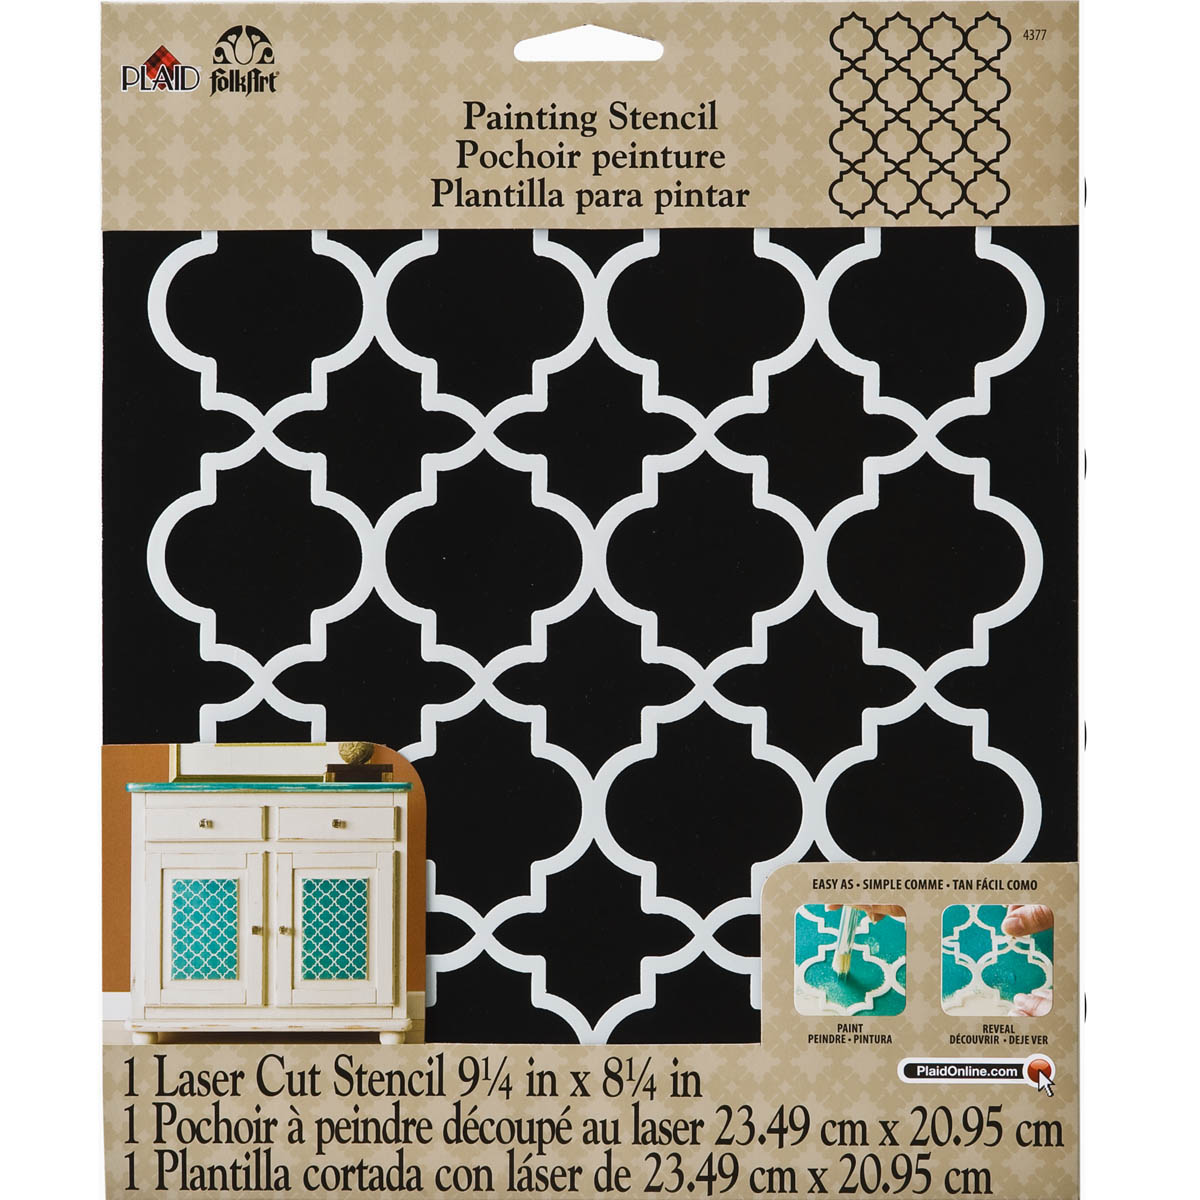 FolkArt ® Painting Stencils - Large - Moroccan Tile - 4377